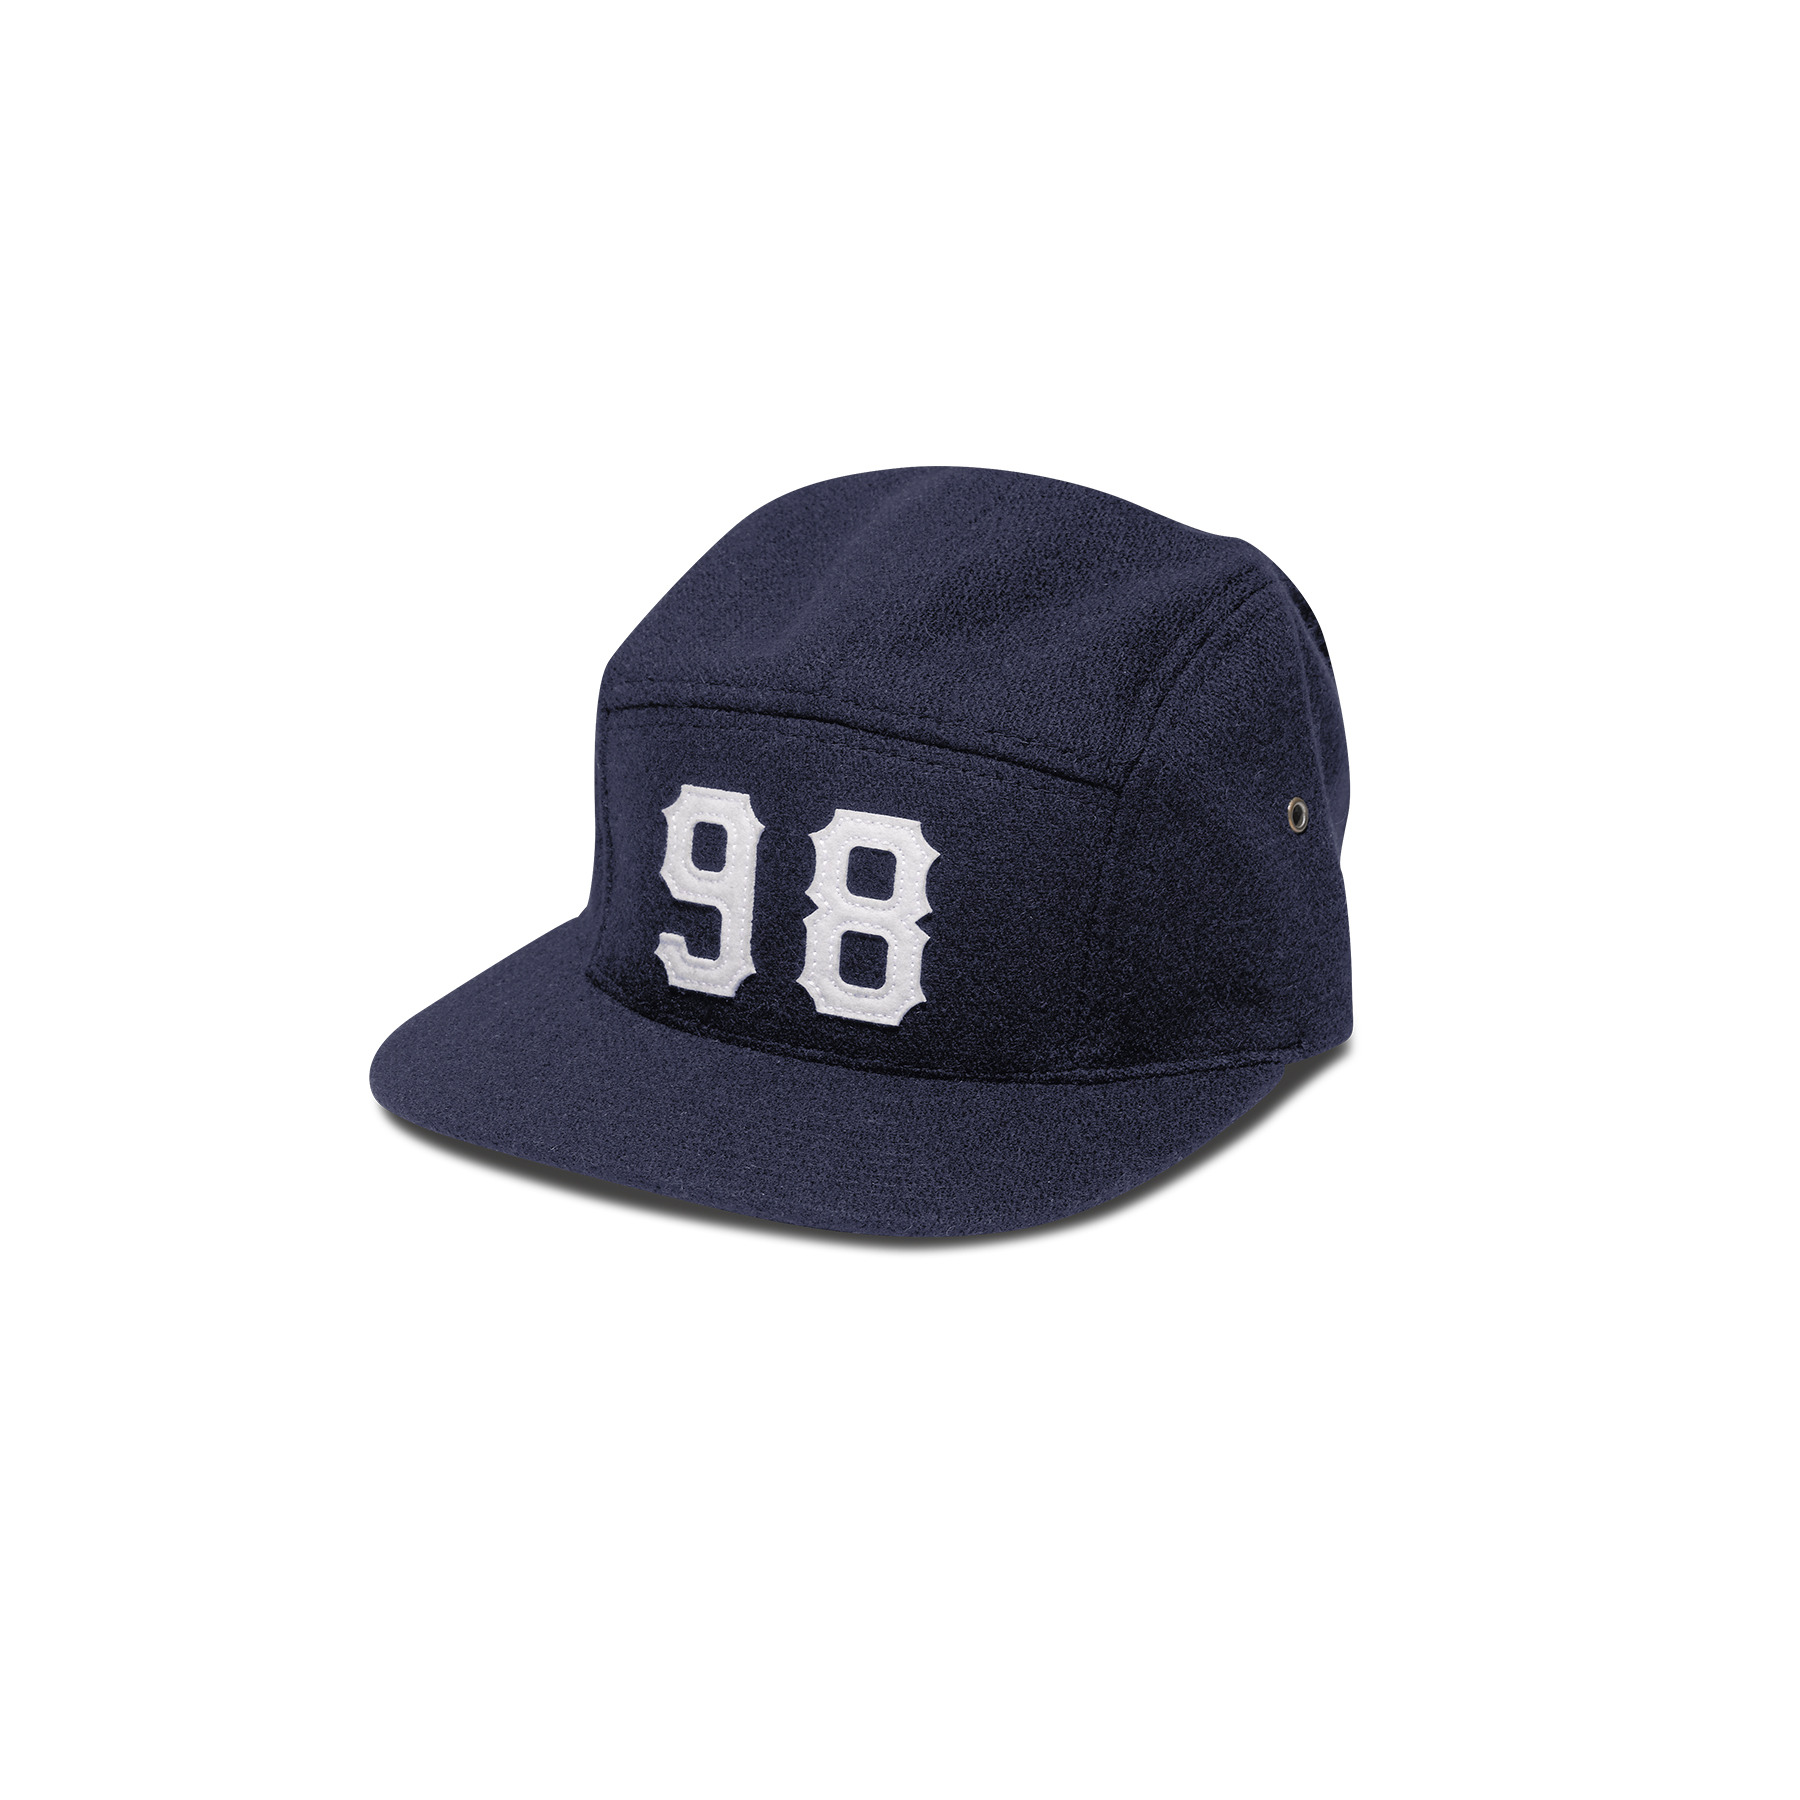 hol_1_headwear_del_1_2__0014_hat--035_navy.jpg